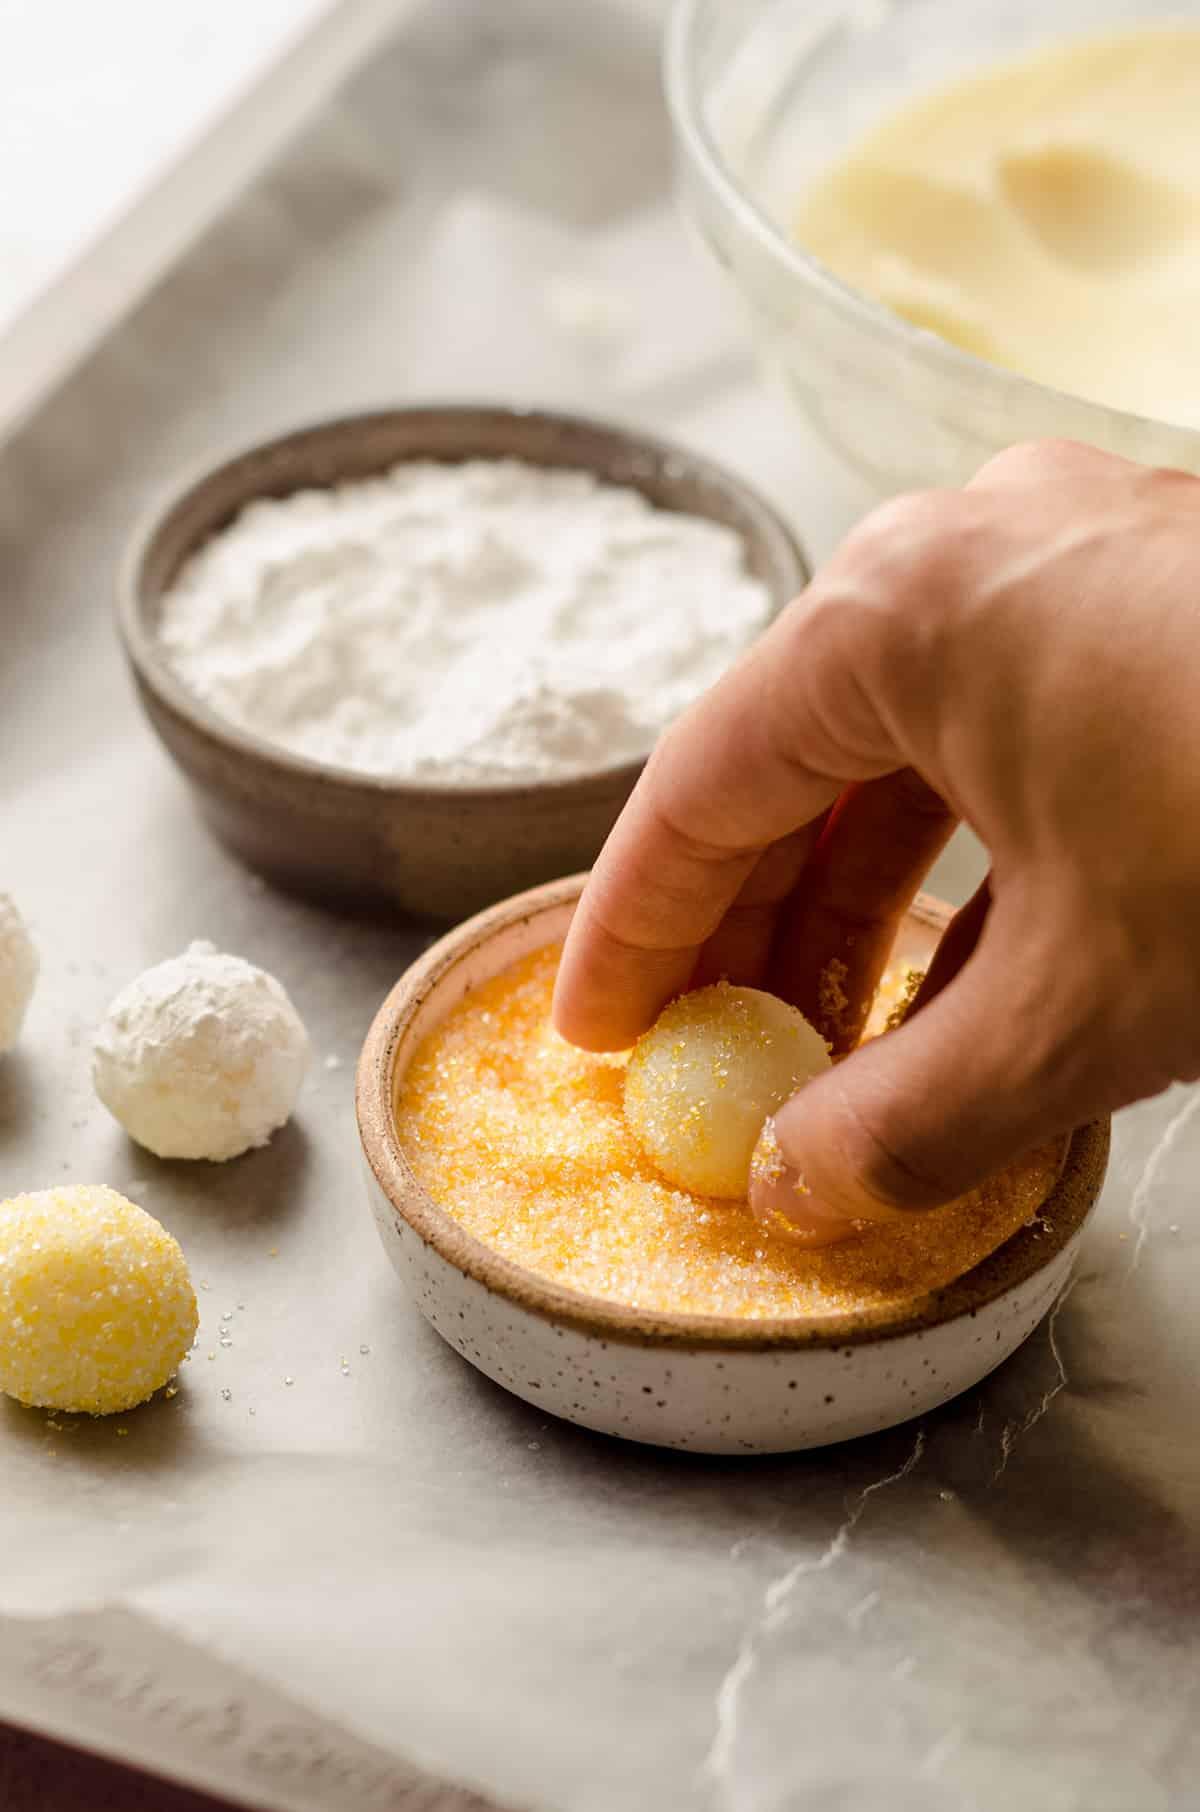 coating a lemon truffle in sprinkles